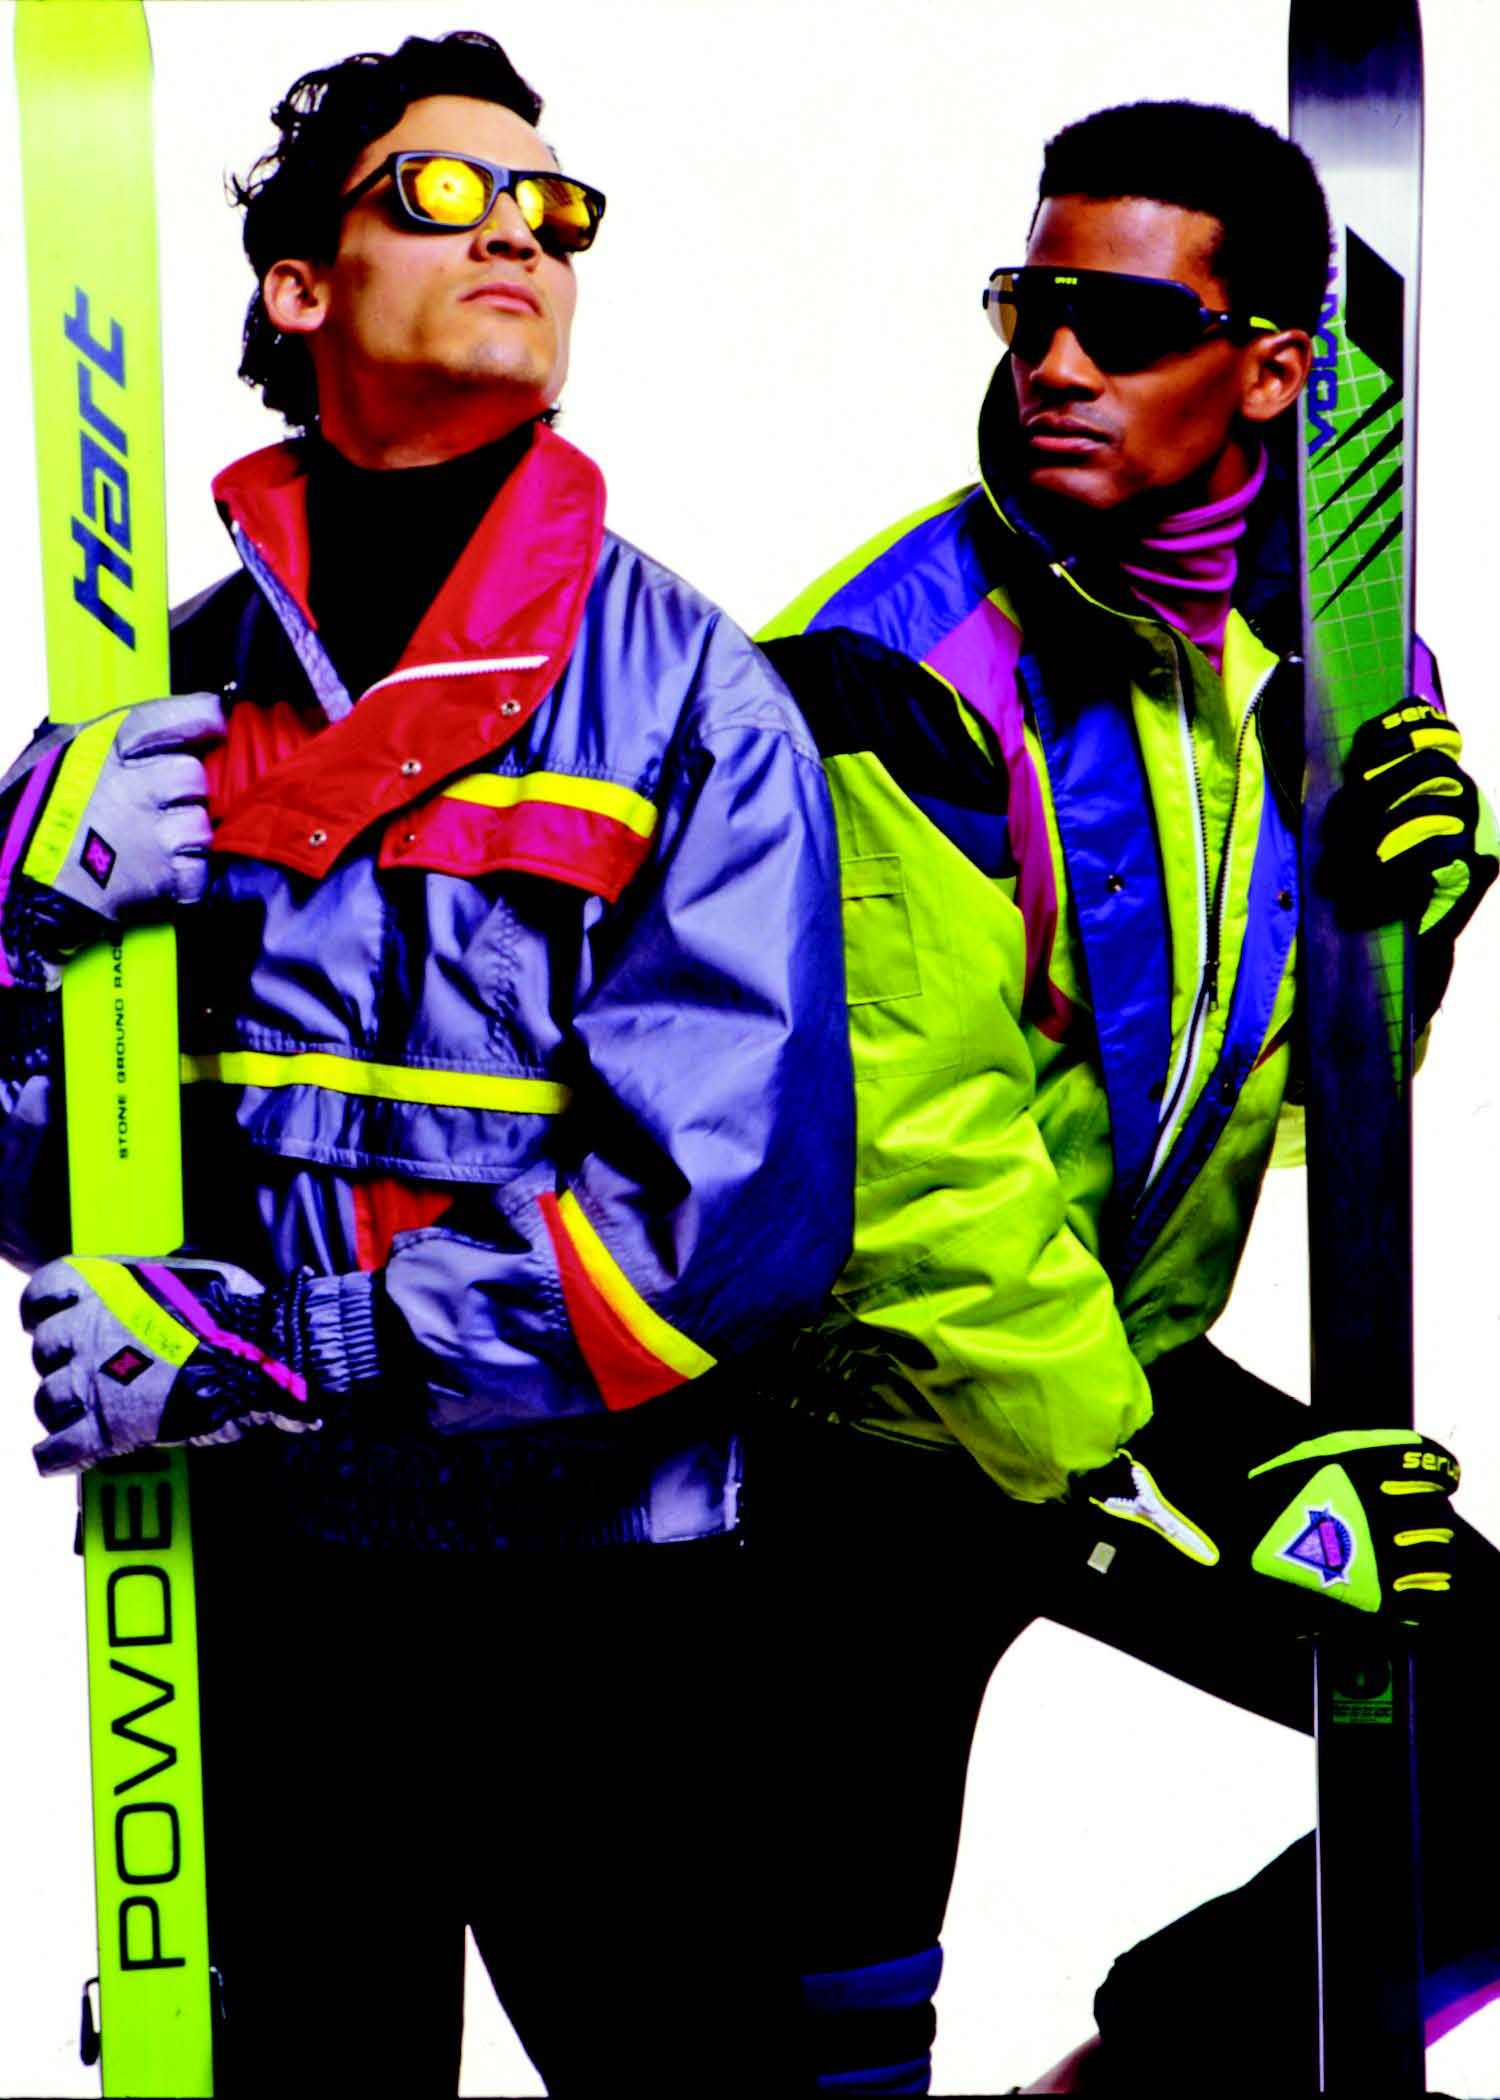 1980s Skiing | 1980s ski style | retro ski clothing | SKI Magazine Read more about The Fashion of Downhill at www.khunu.com/blogs/khunuworld